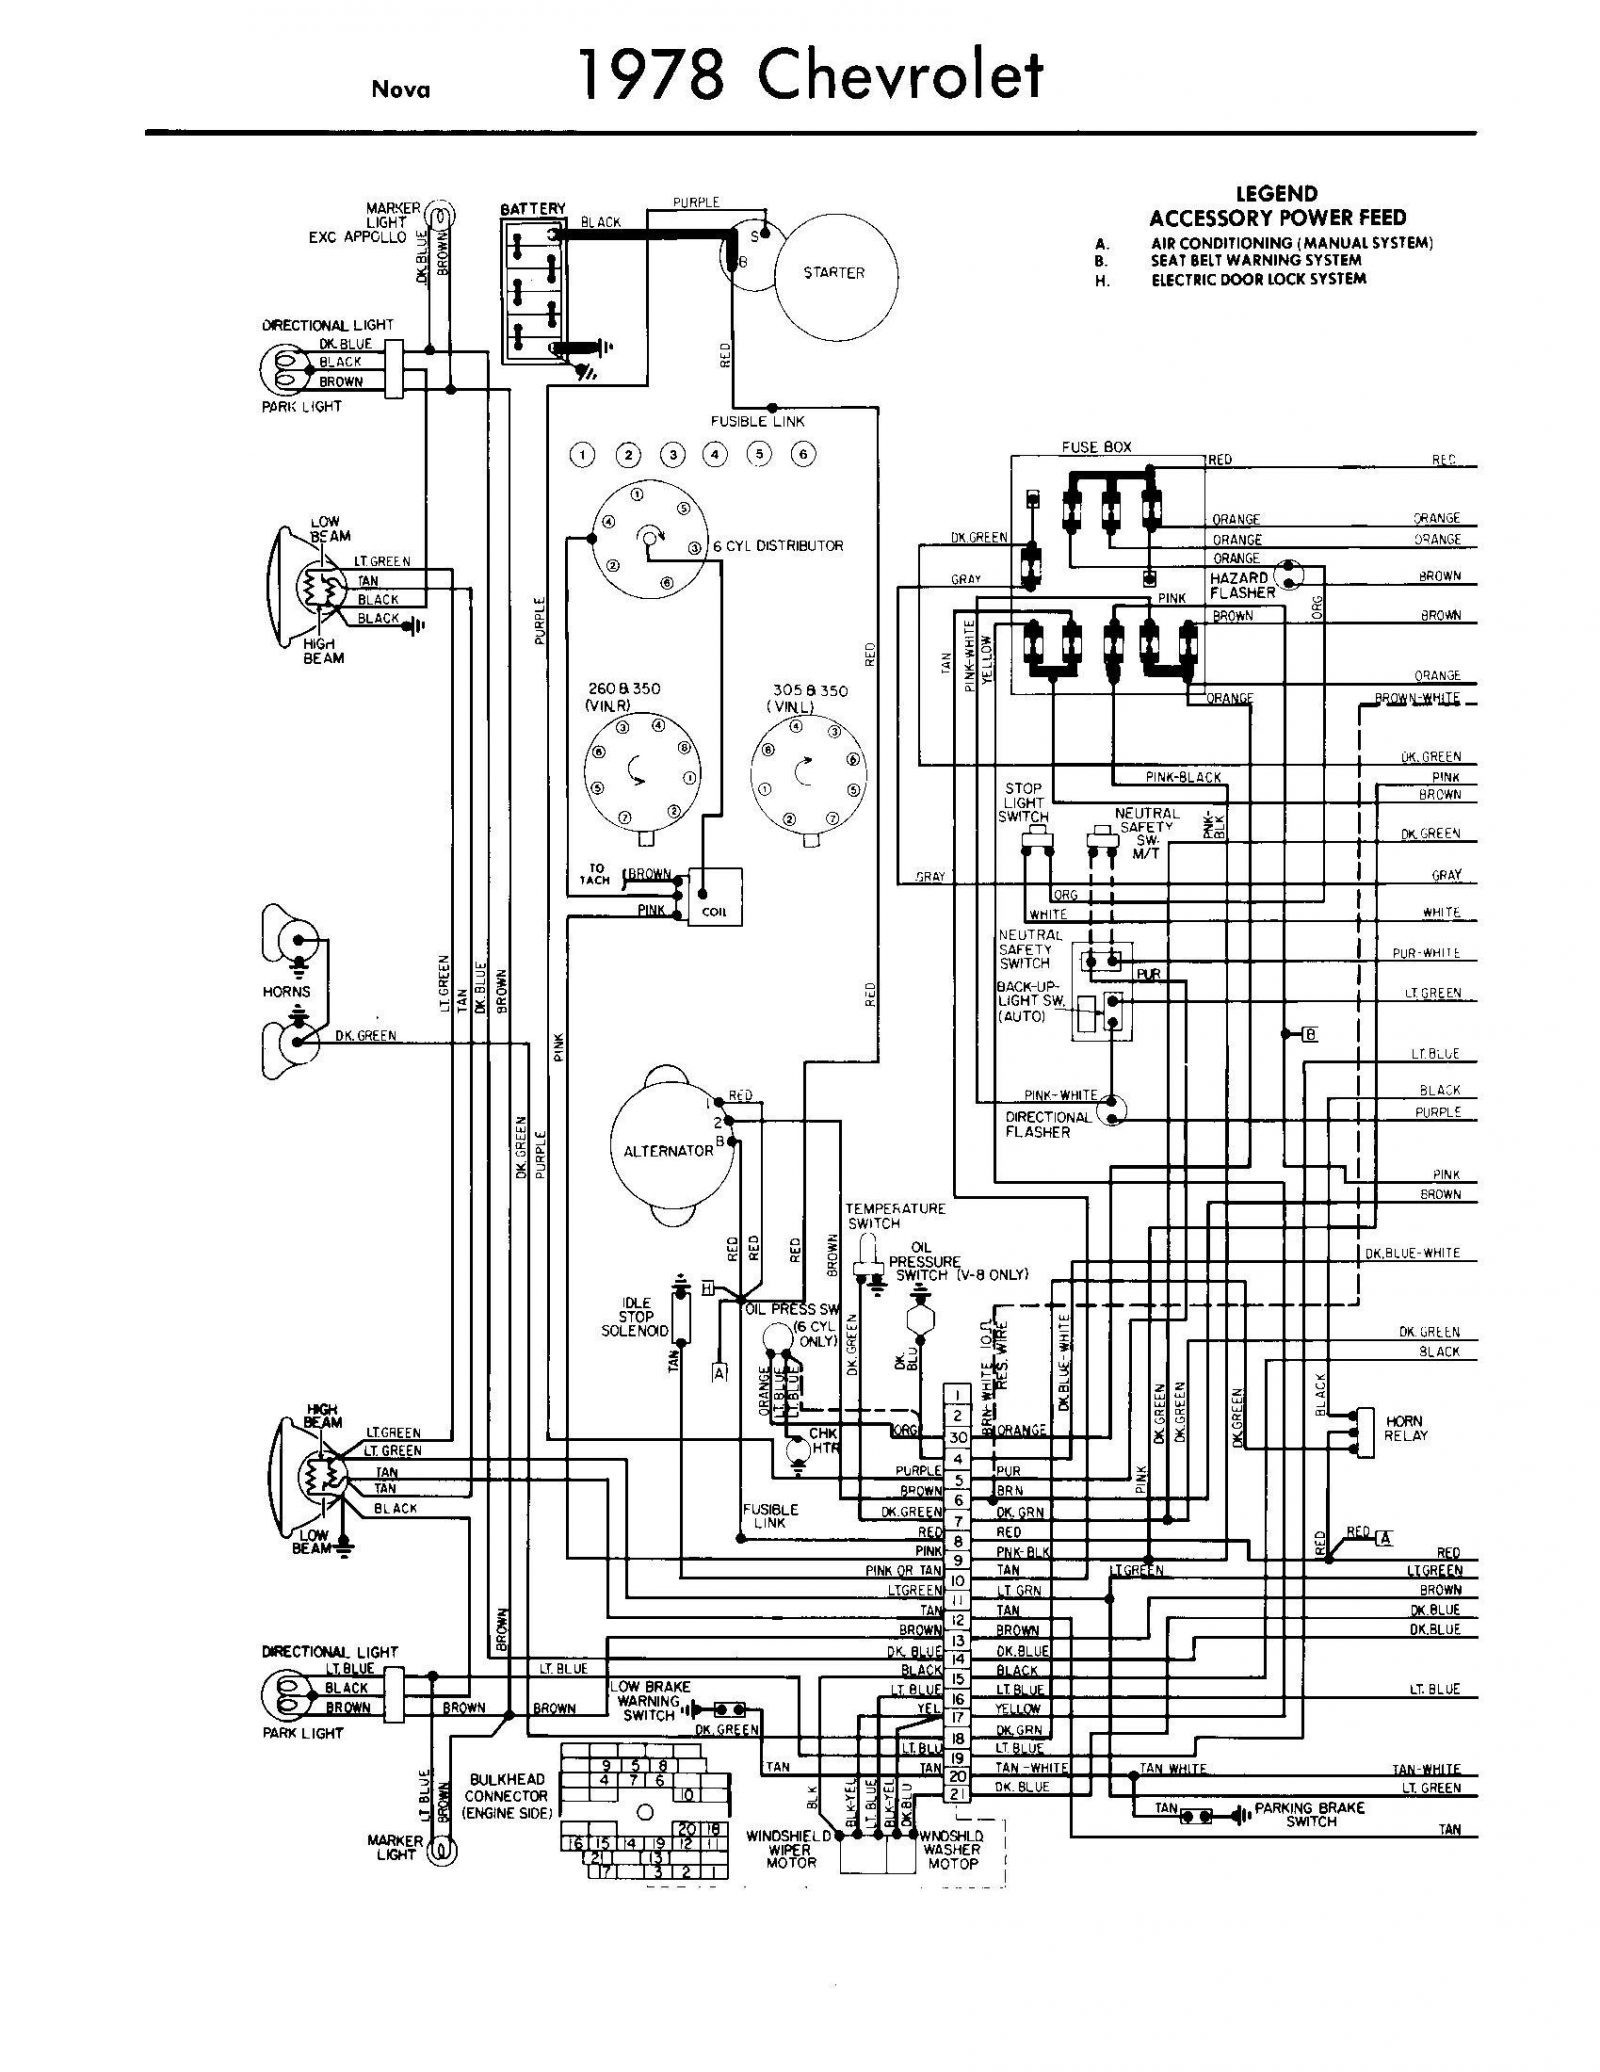 200 Amp Meter Base Wiring Diagram Fresh Delighted Milbank Meter socket Wiring Diagram Electrical